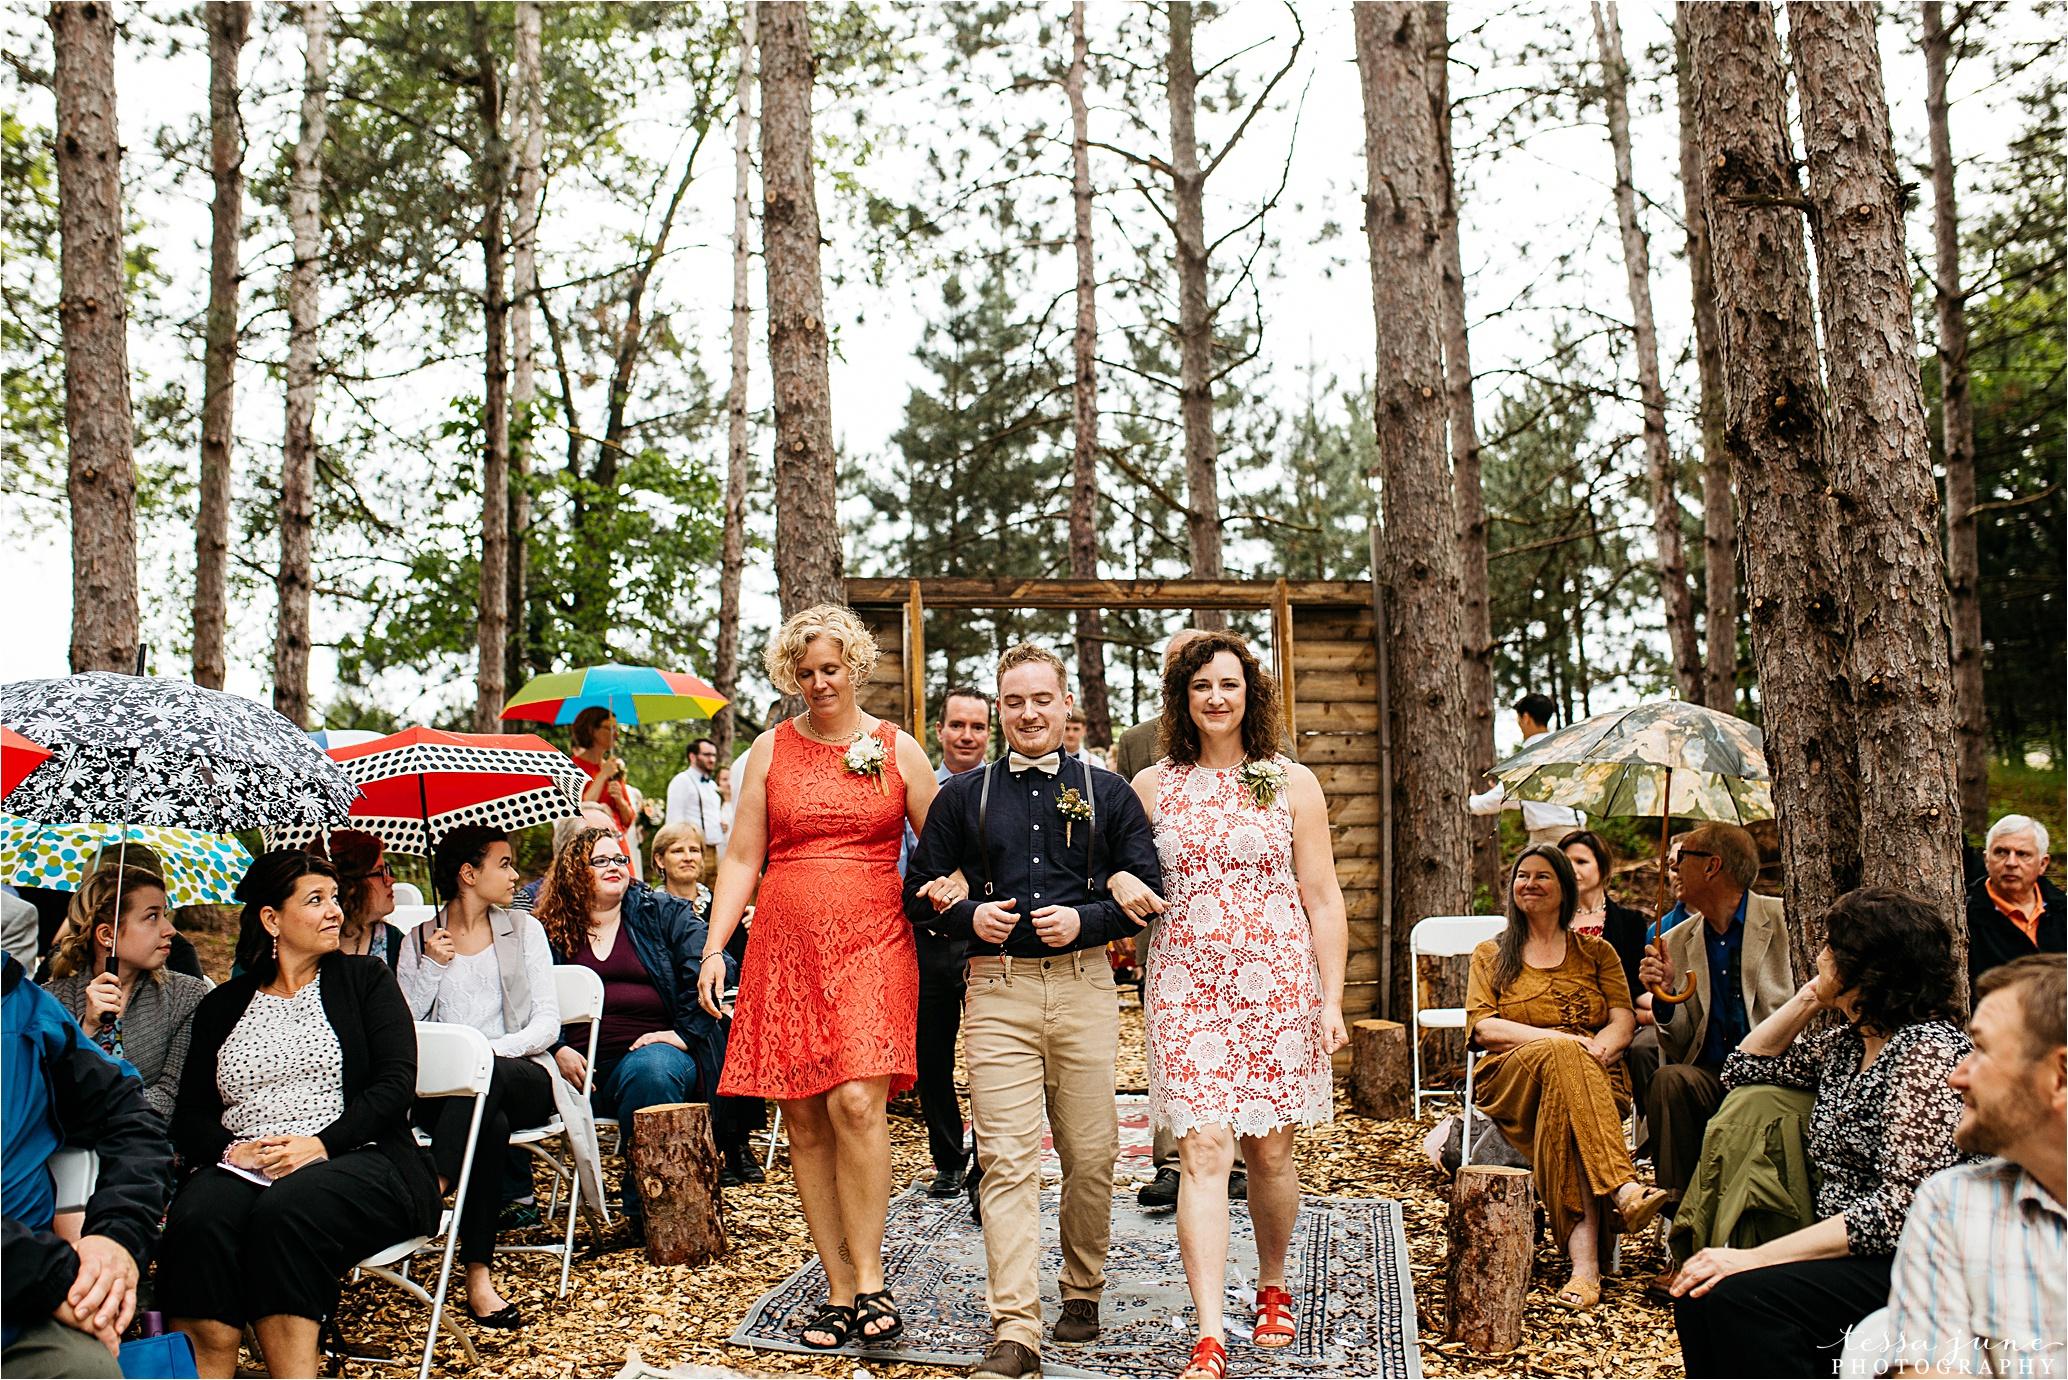 bohemian-forest-wedding-stillwater-minnesota-flower-crown-st-cloud-photographer-ceremony